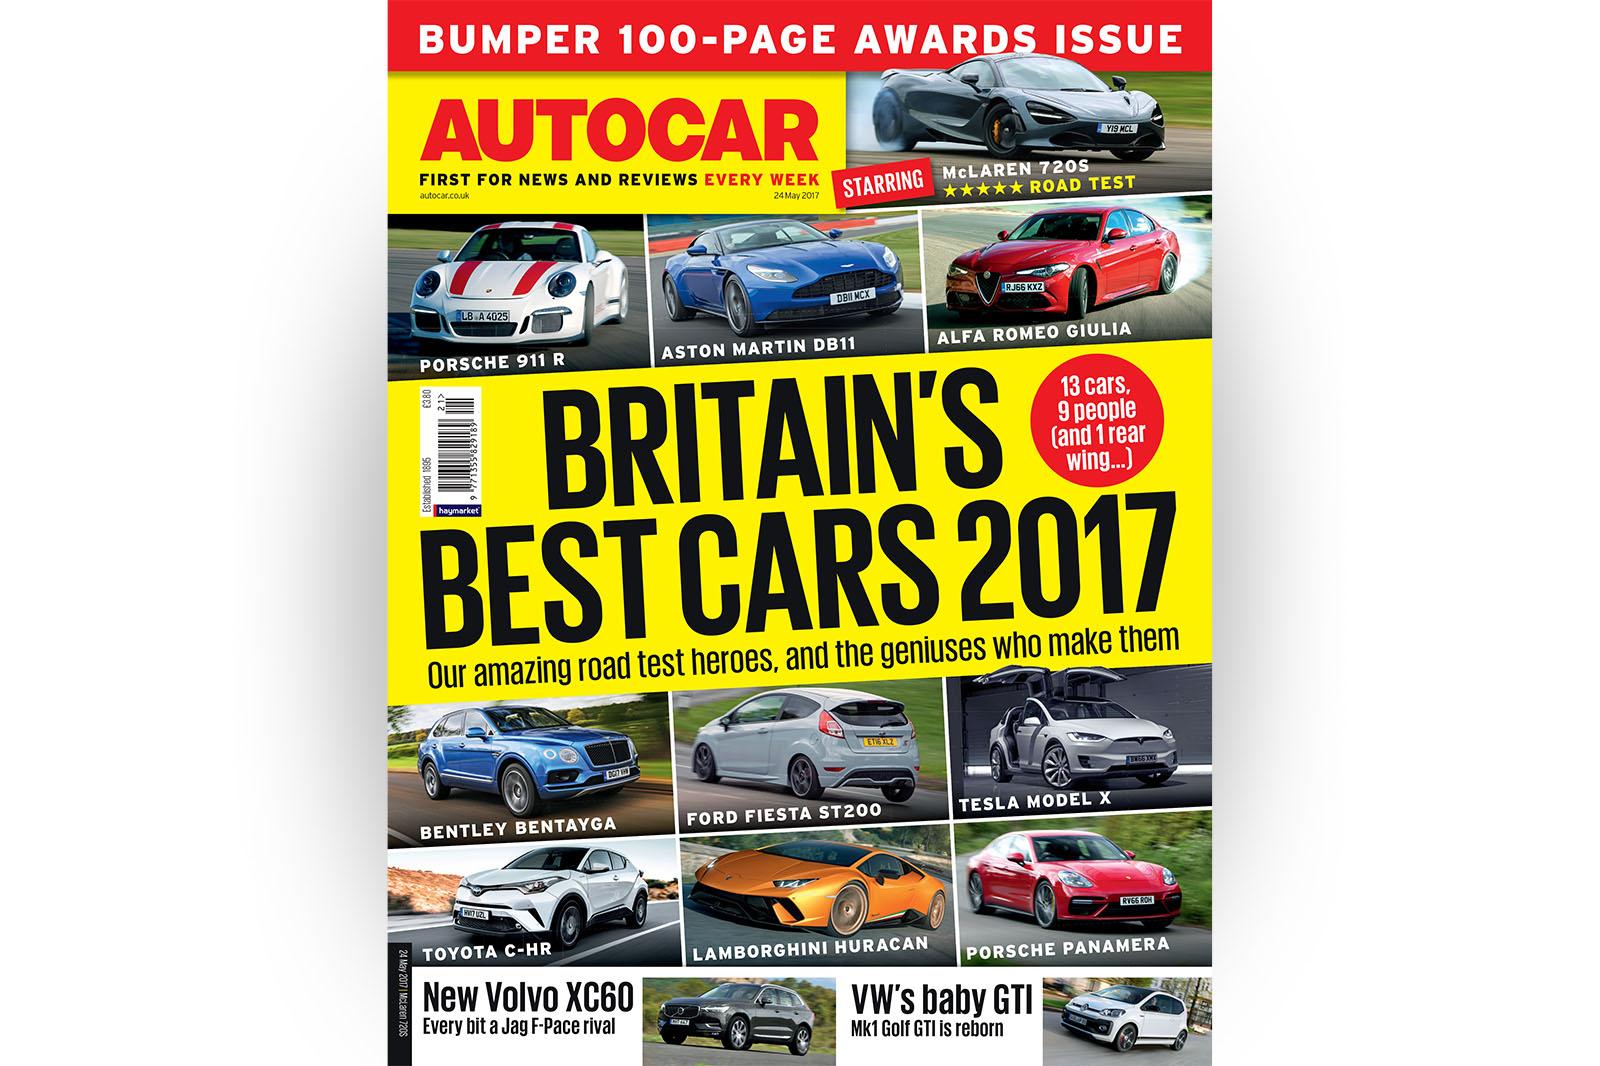 Журнал Autocar 24 мая — вышел